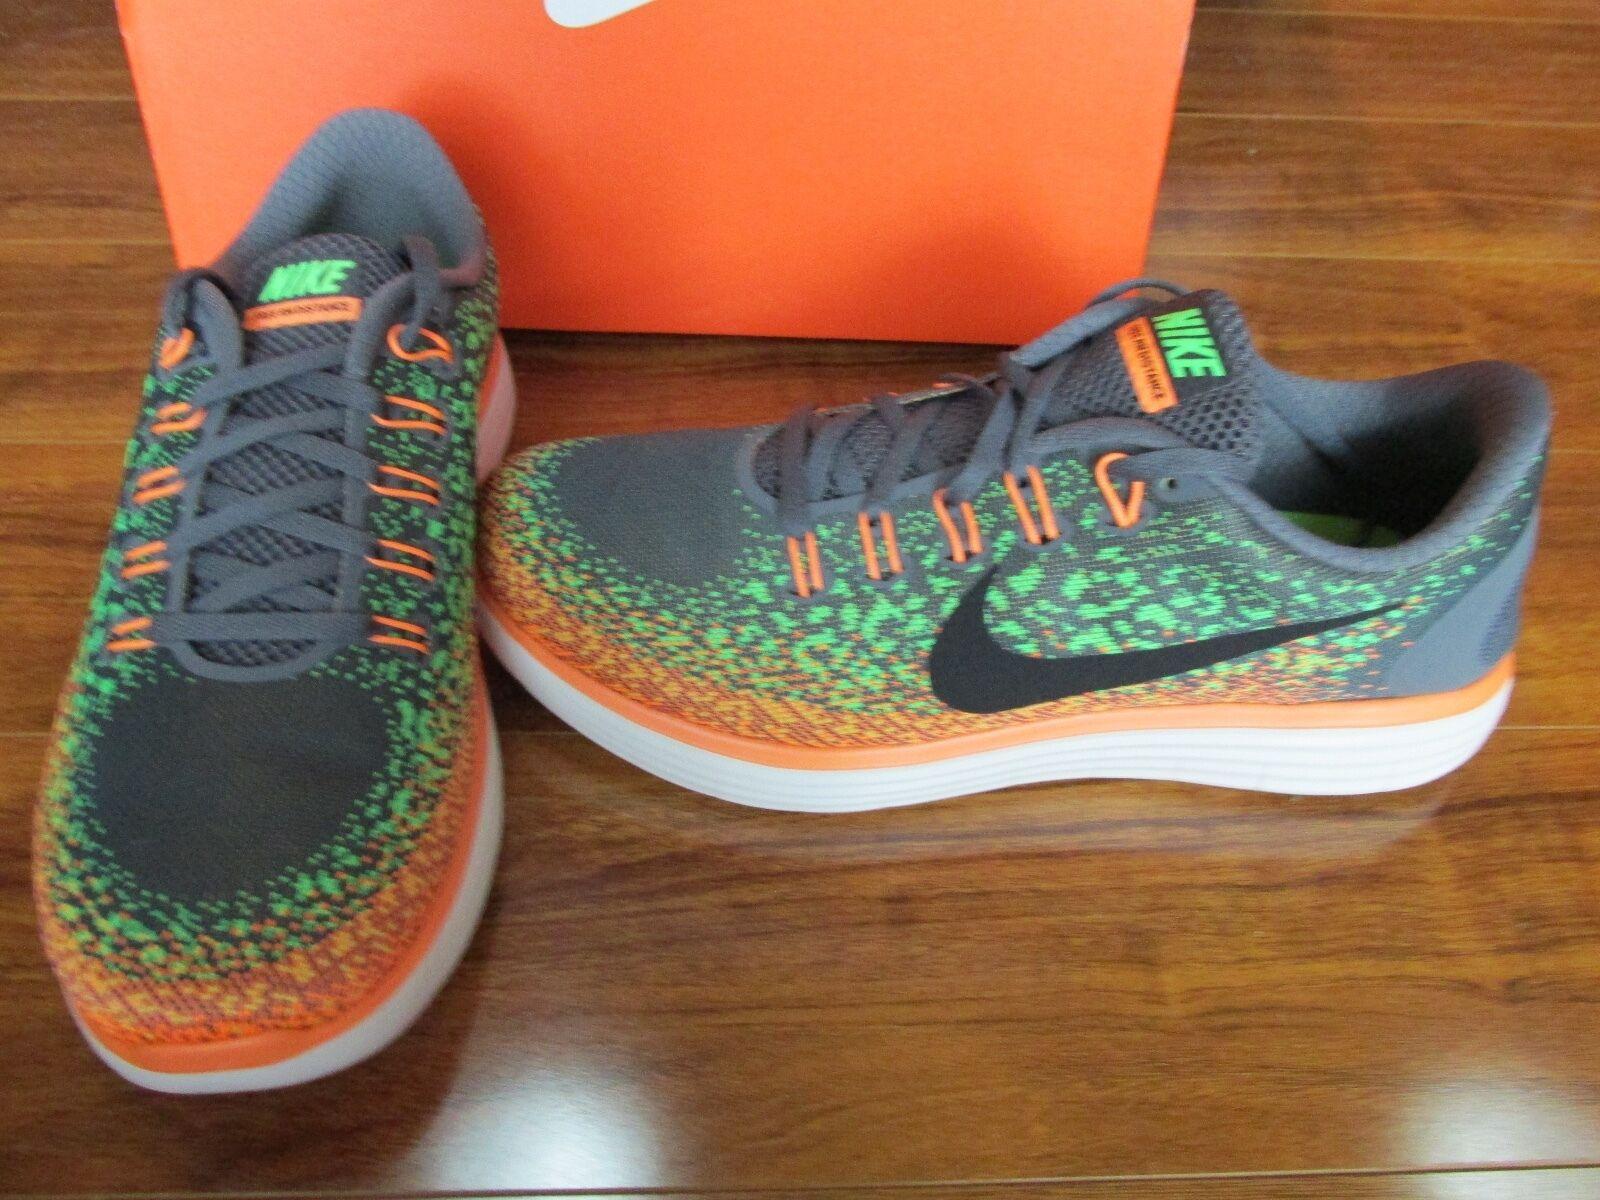 9b081711efa75 NEW NIKE Free Run Distance Distance Distance Running Shoes MENS 11 Grey  Green Orange 827115 003